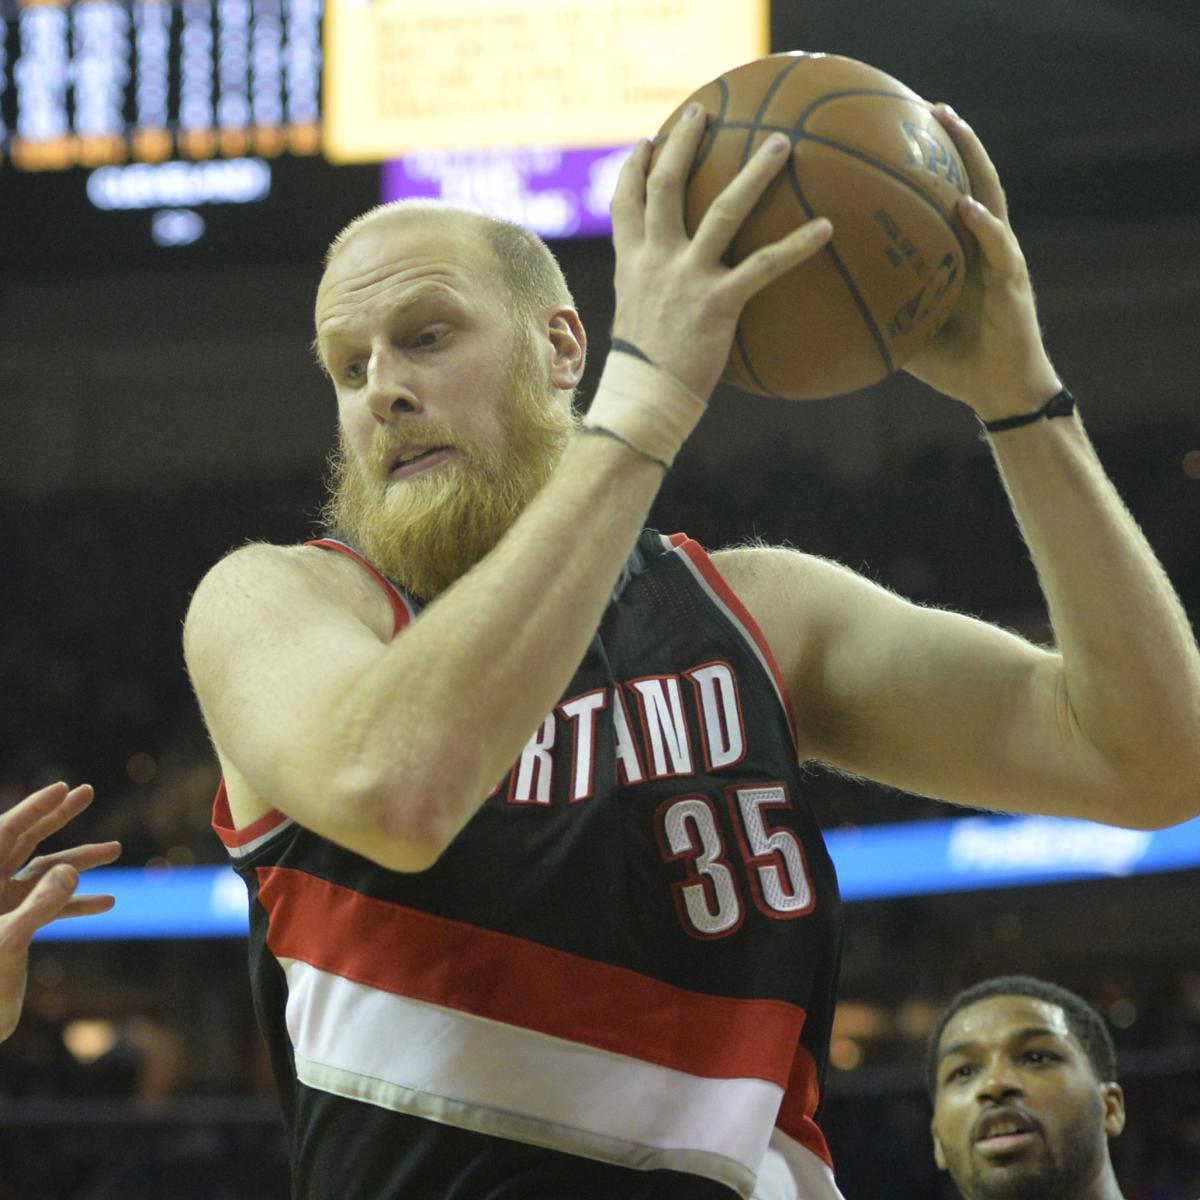 Portland Trail Blazers Injury News: Chris Kaman Injury: Updates On Trail Blazers Center's Back